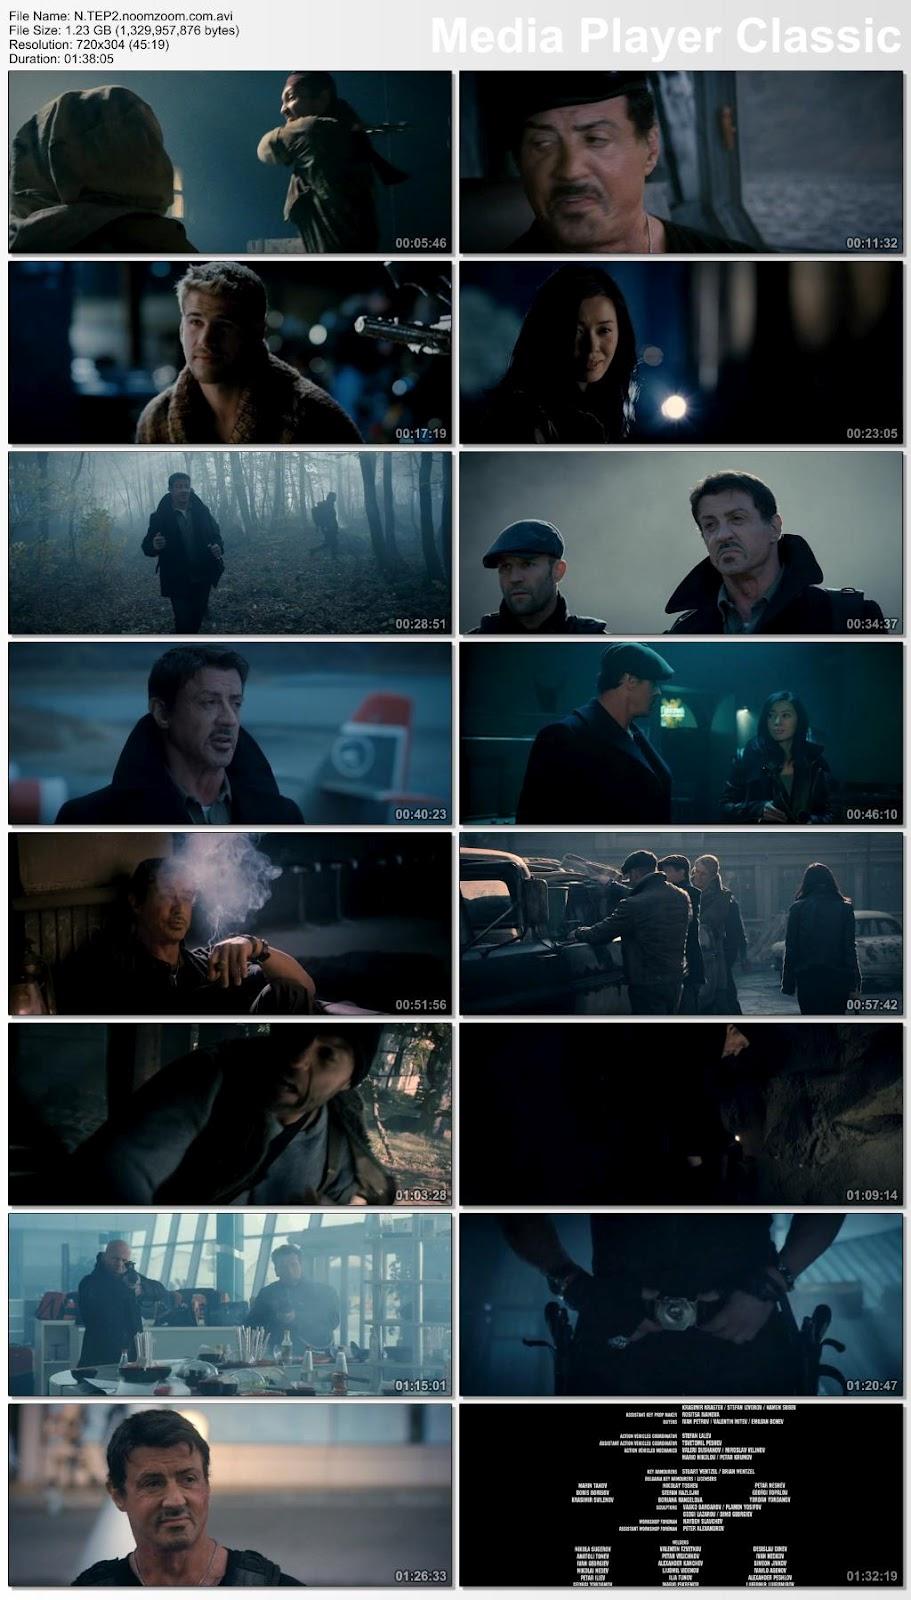 [MINI Super-HQ] Marvel Studios 23-Movie Collection (2008